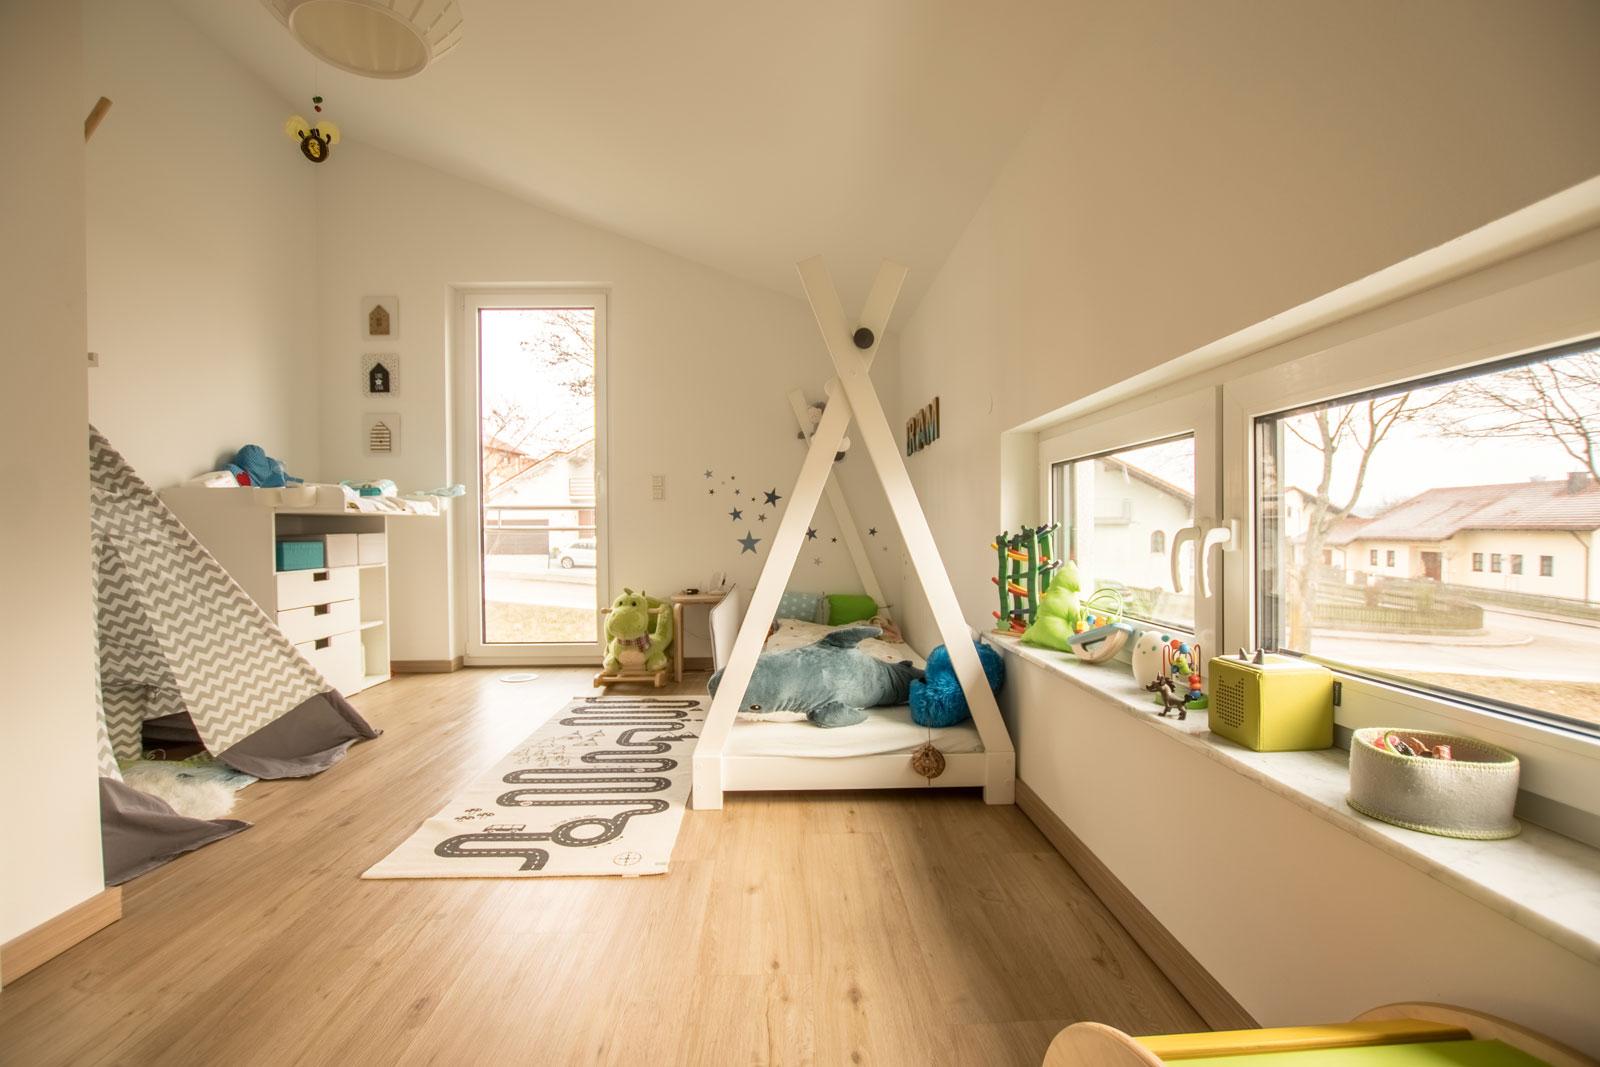 Immobilienfoto Kinderzimmer